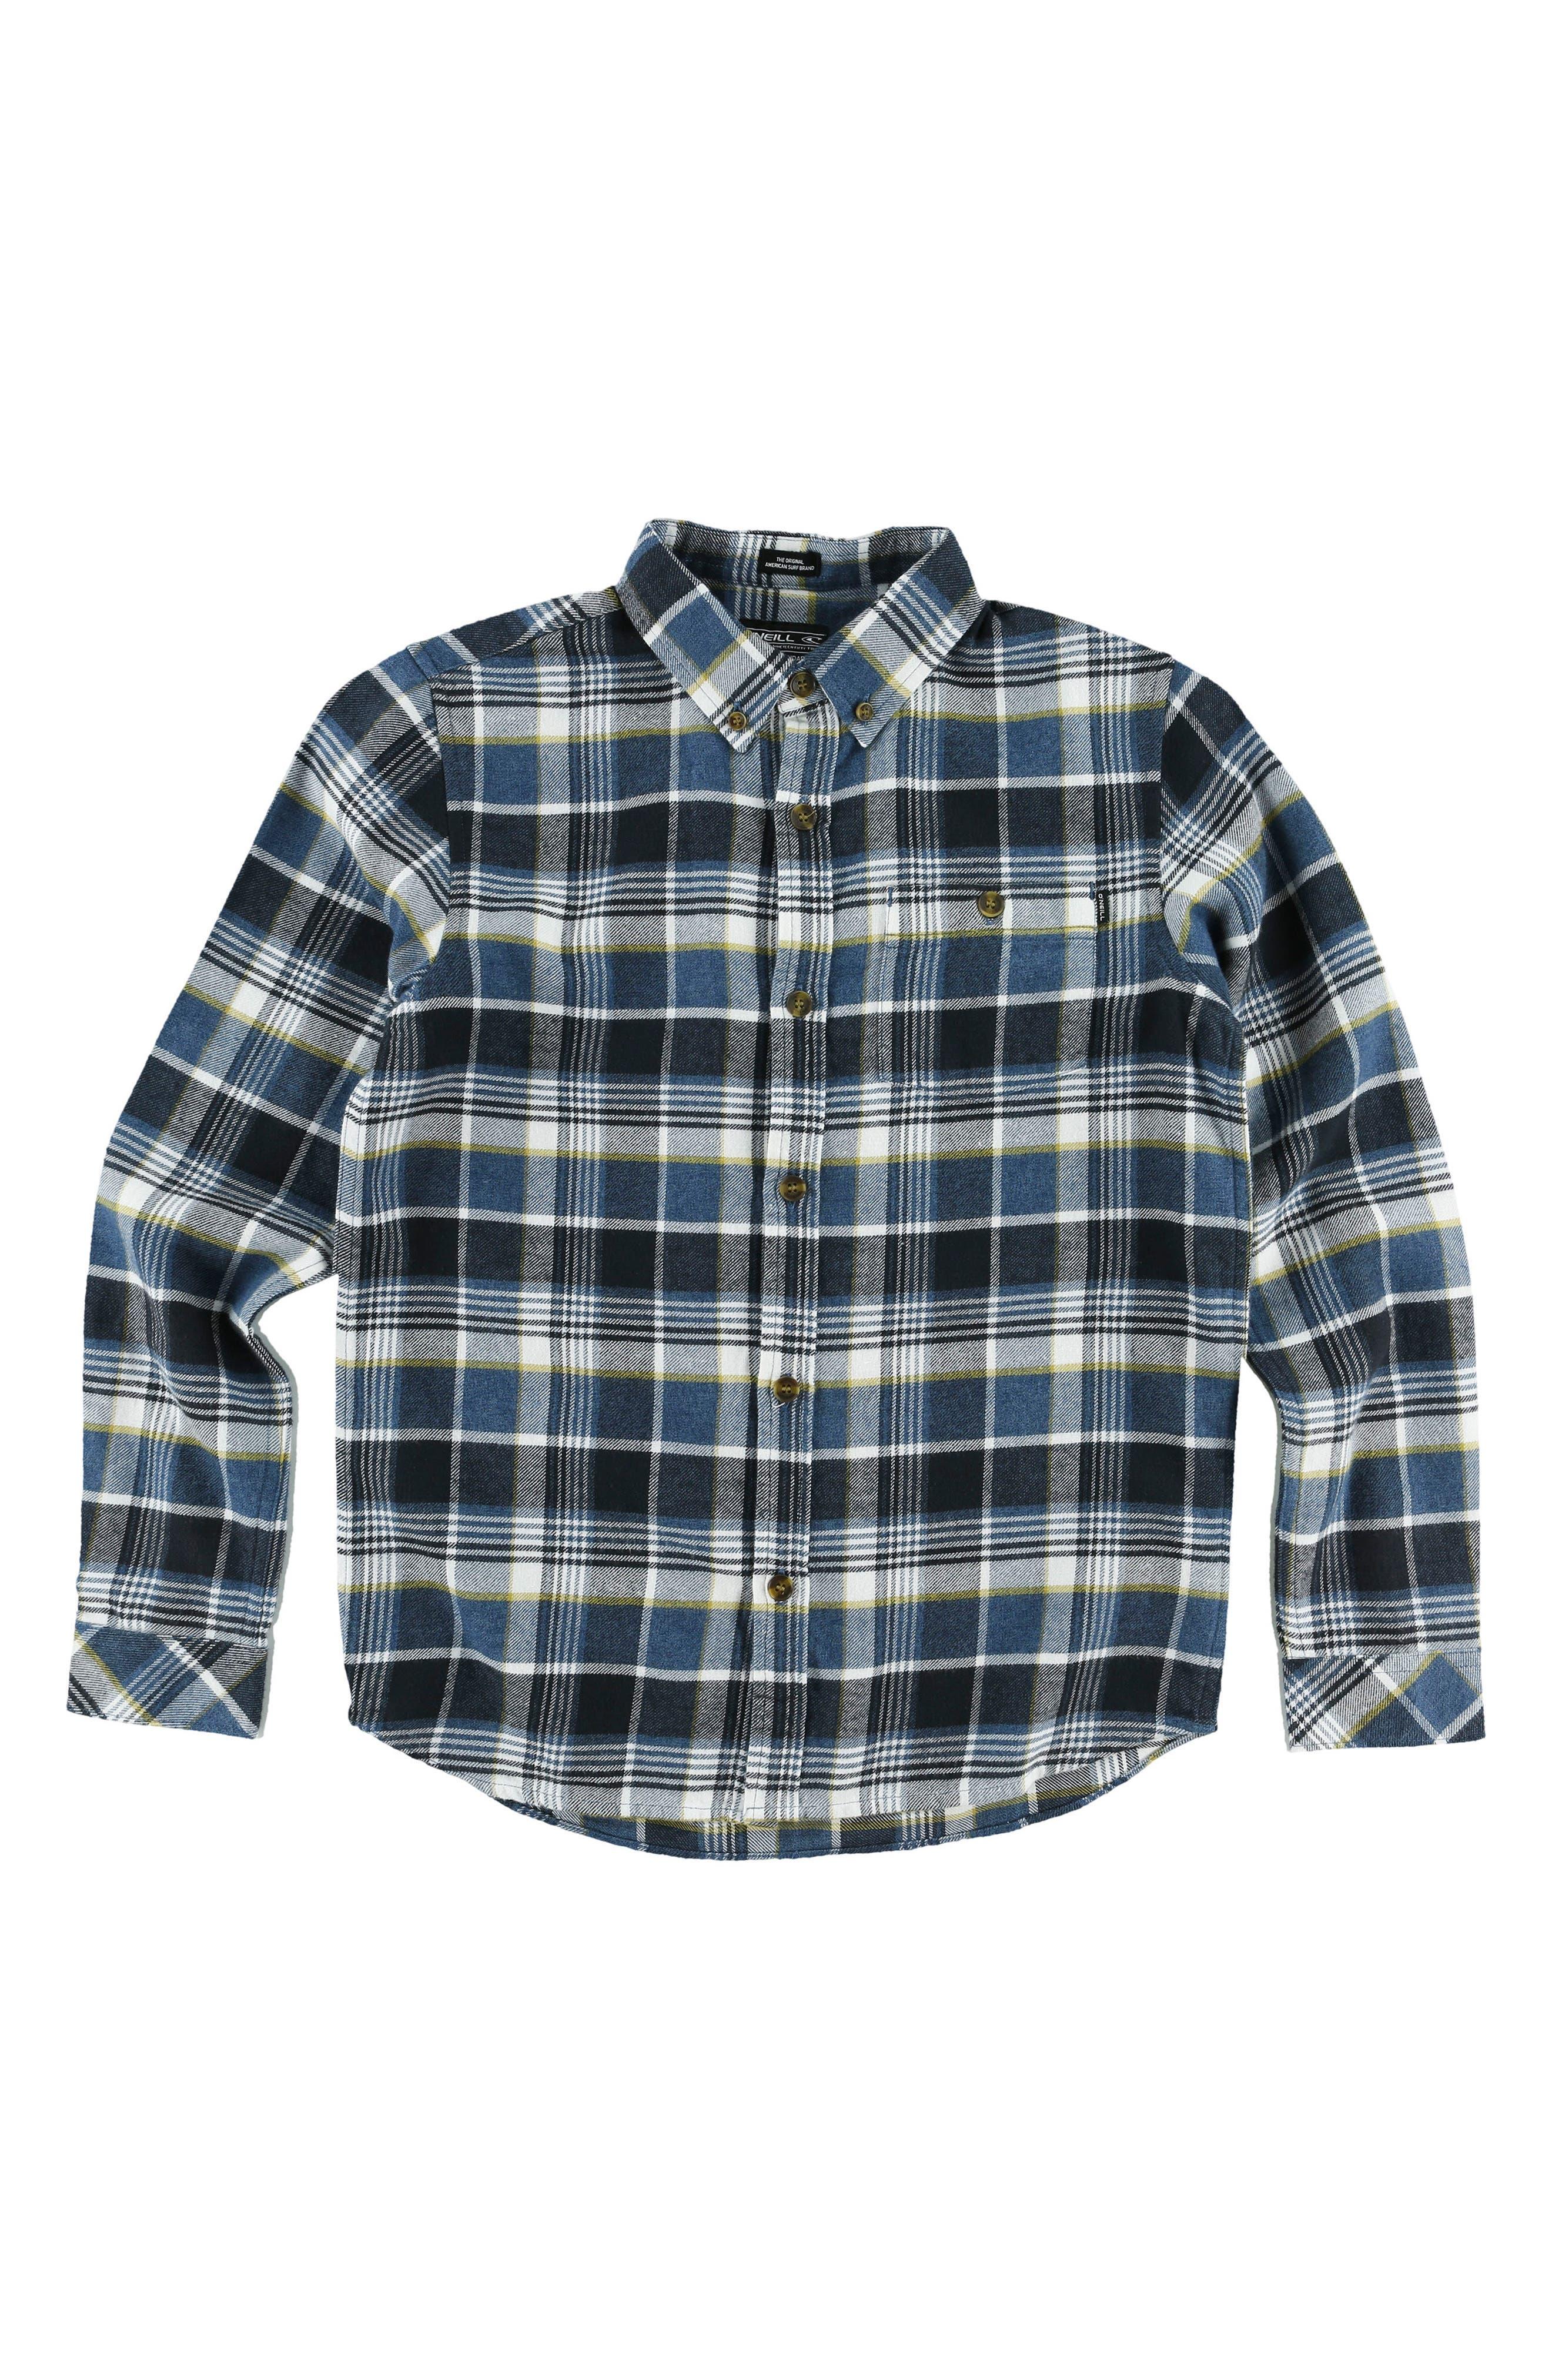 Main Image - O'Neill Redmond Flannel Shirt (Big Boys)